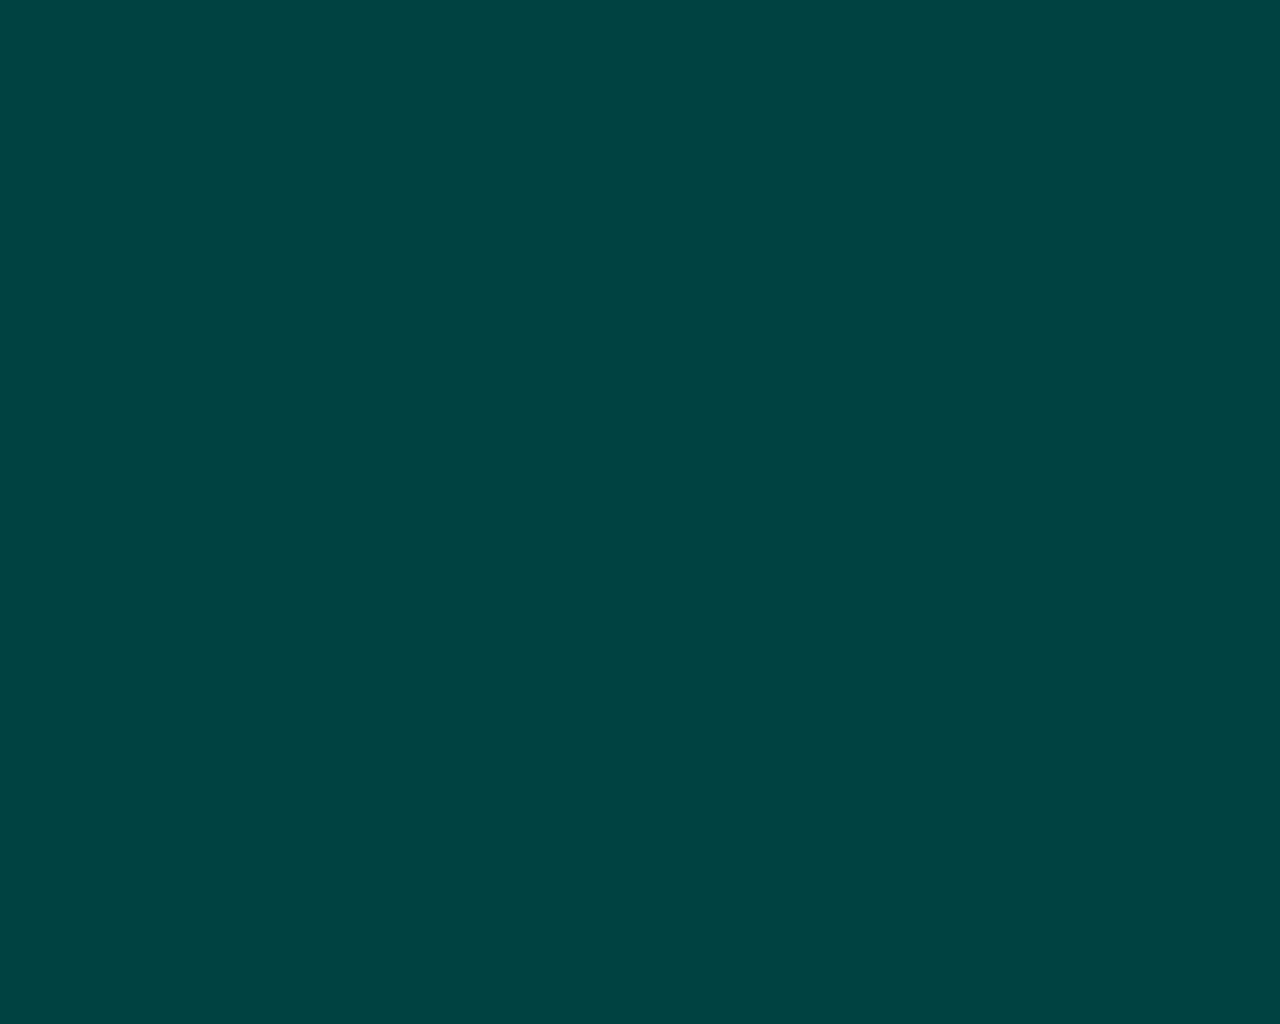 1280x1024 Warm Black Solid Color Background